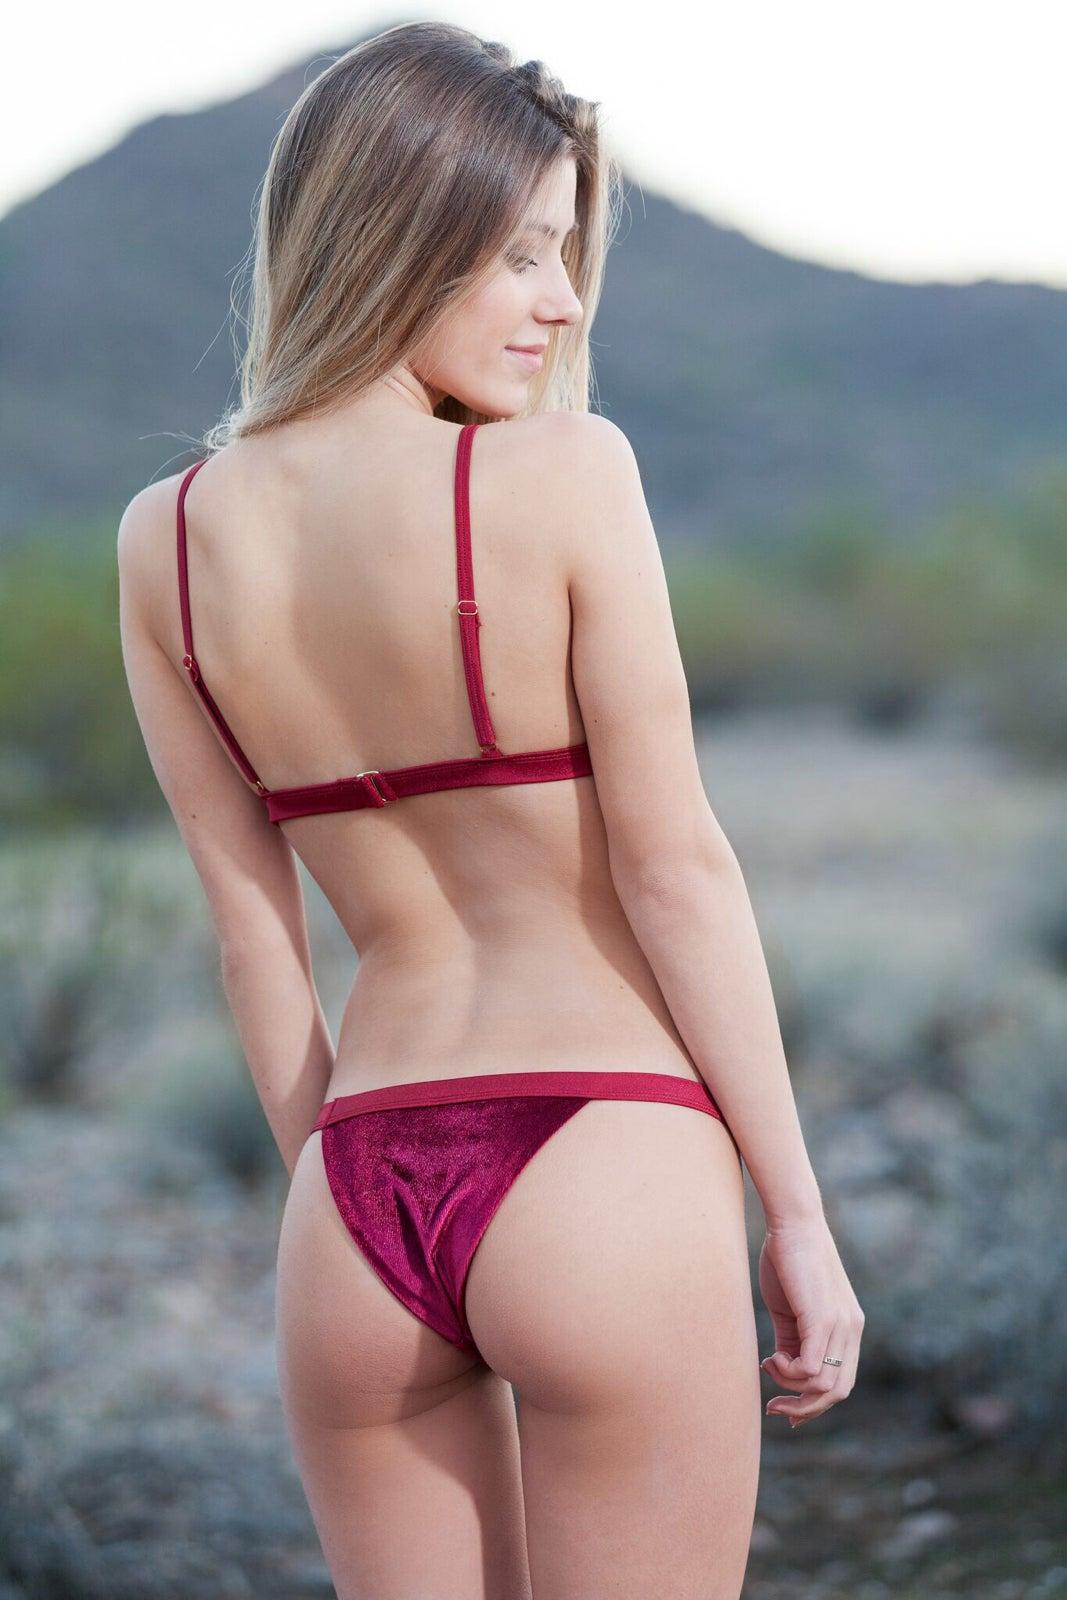 jj bikinis jane velvet bikini carthago wohnmobile cartoon mode